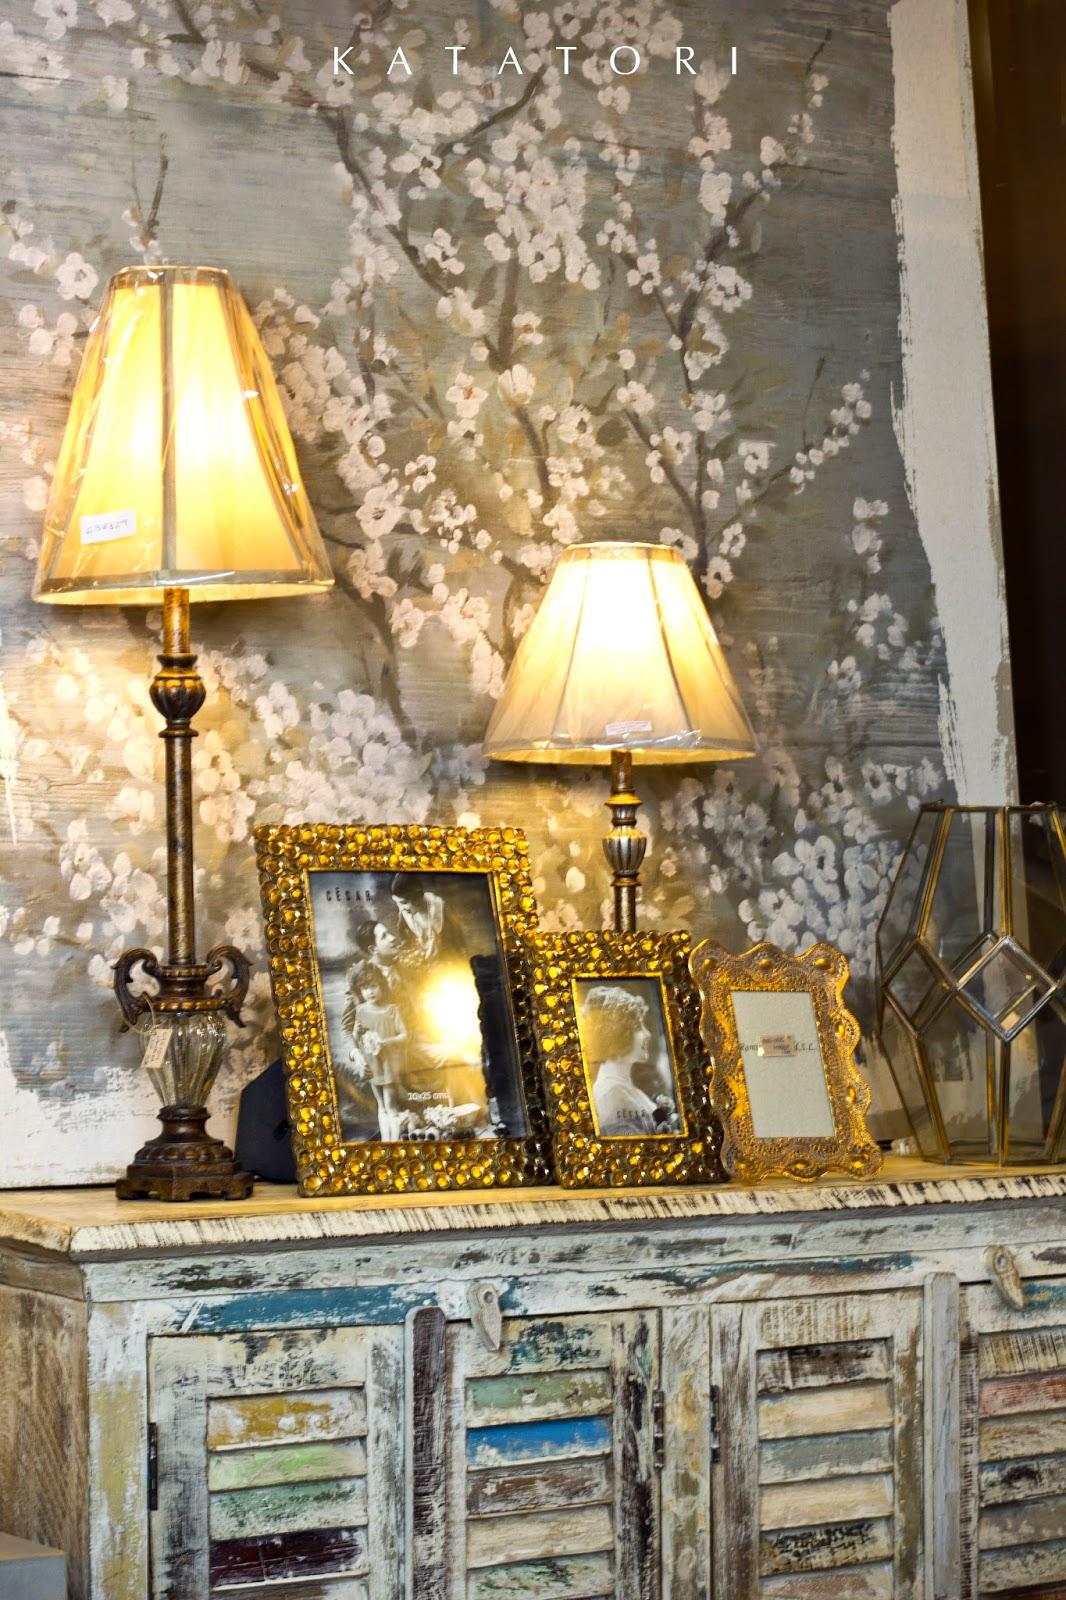 Katatori interiores classic vintage for Muebles poligono el manchon